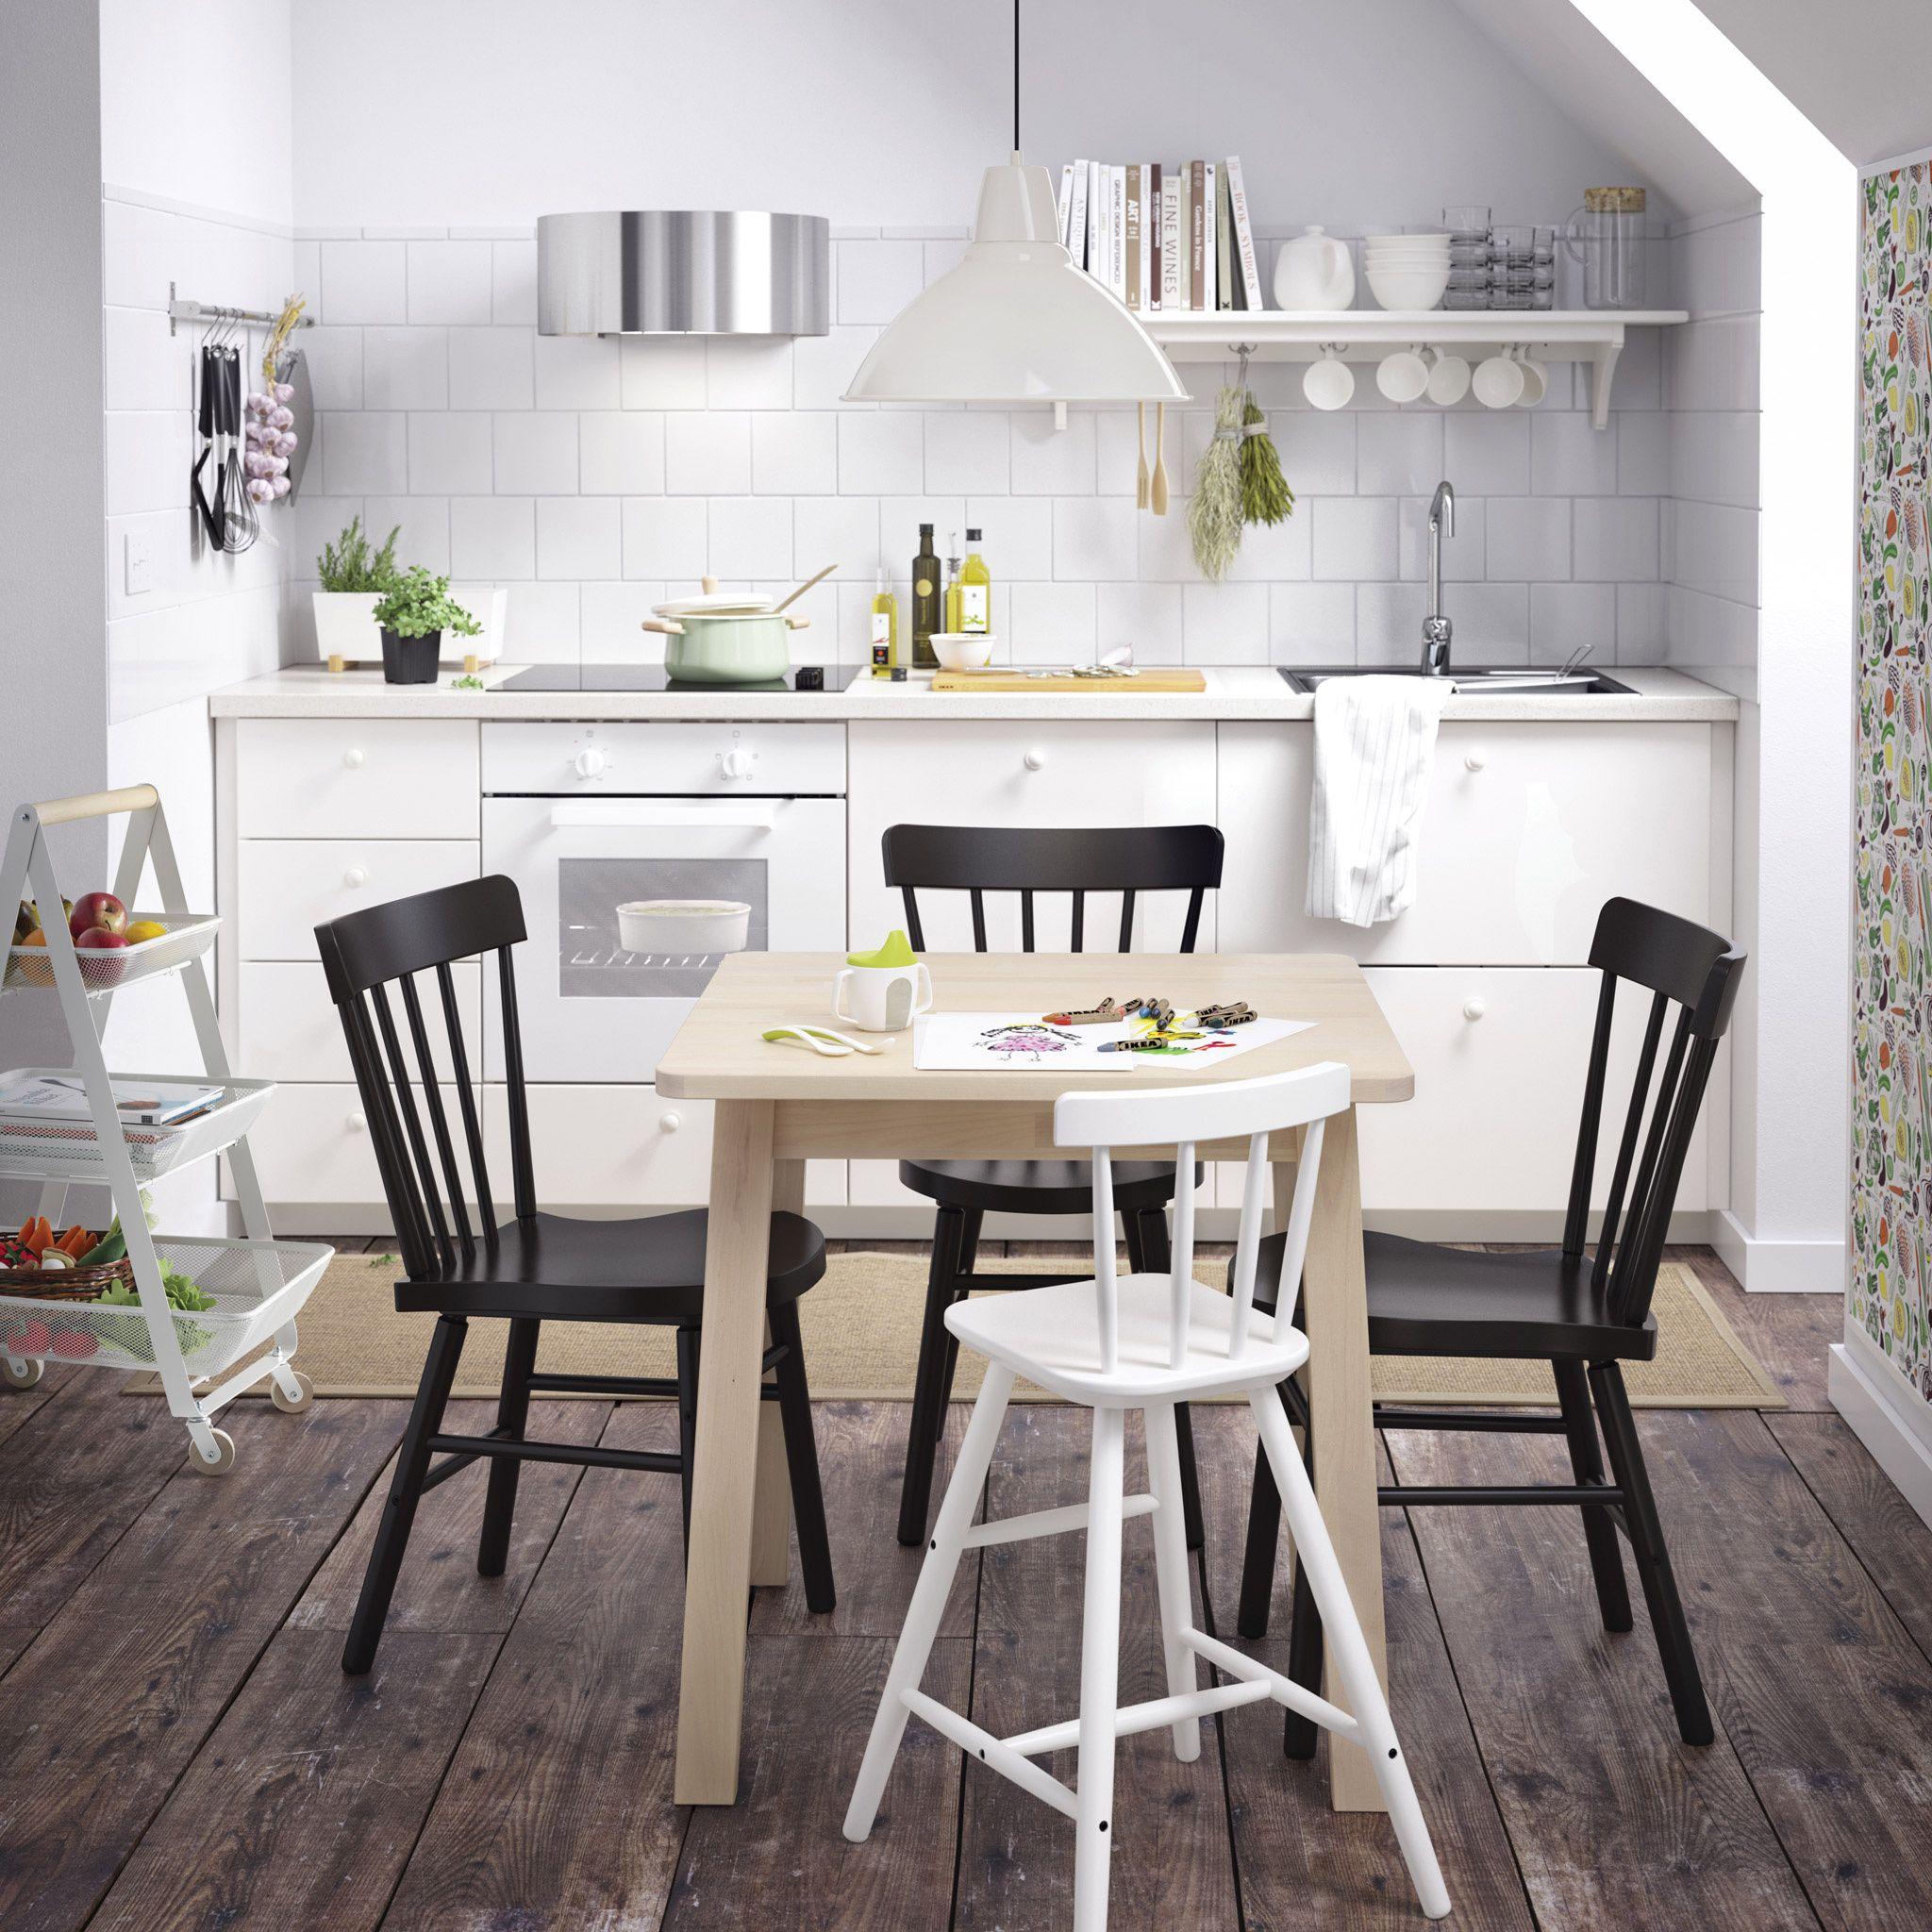 Pin by neby on house plans ideas | Cocinas, Comedores, Cocina ikea